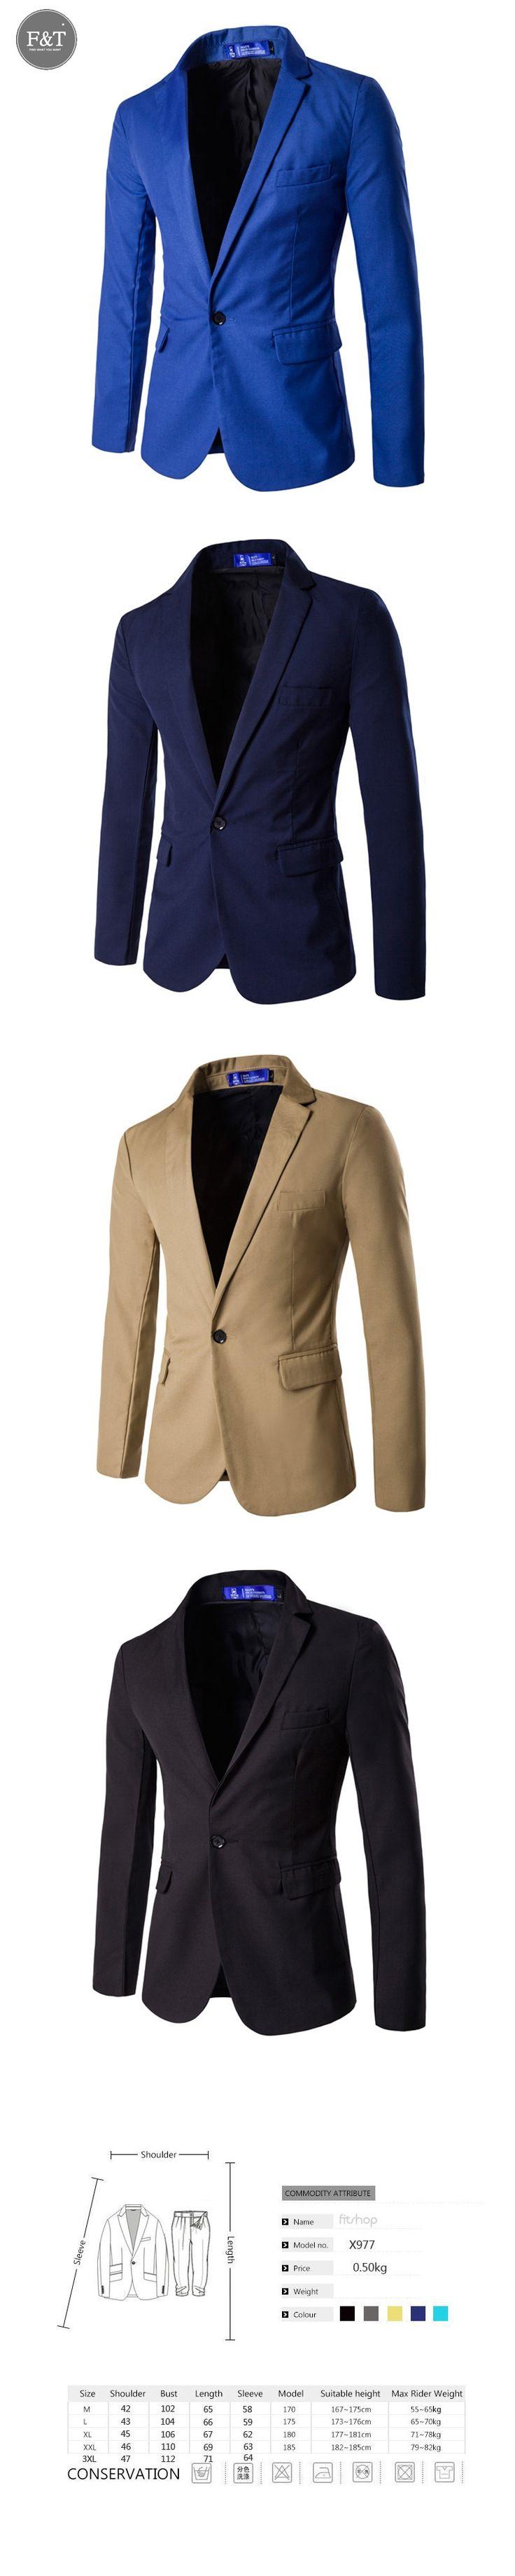 New Luxury Design Blazer Men Casual Slim Fit One Button Jacket Coat Mens Groomsmen Wedding Suit Blazer Masculino Solid